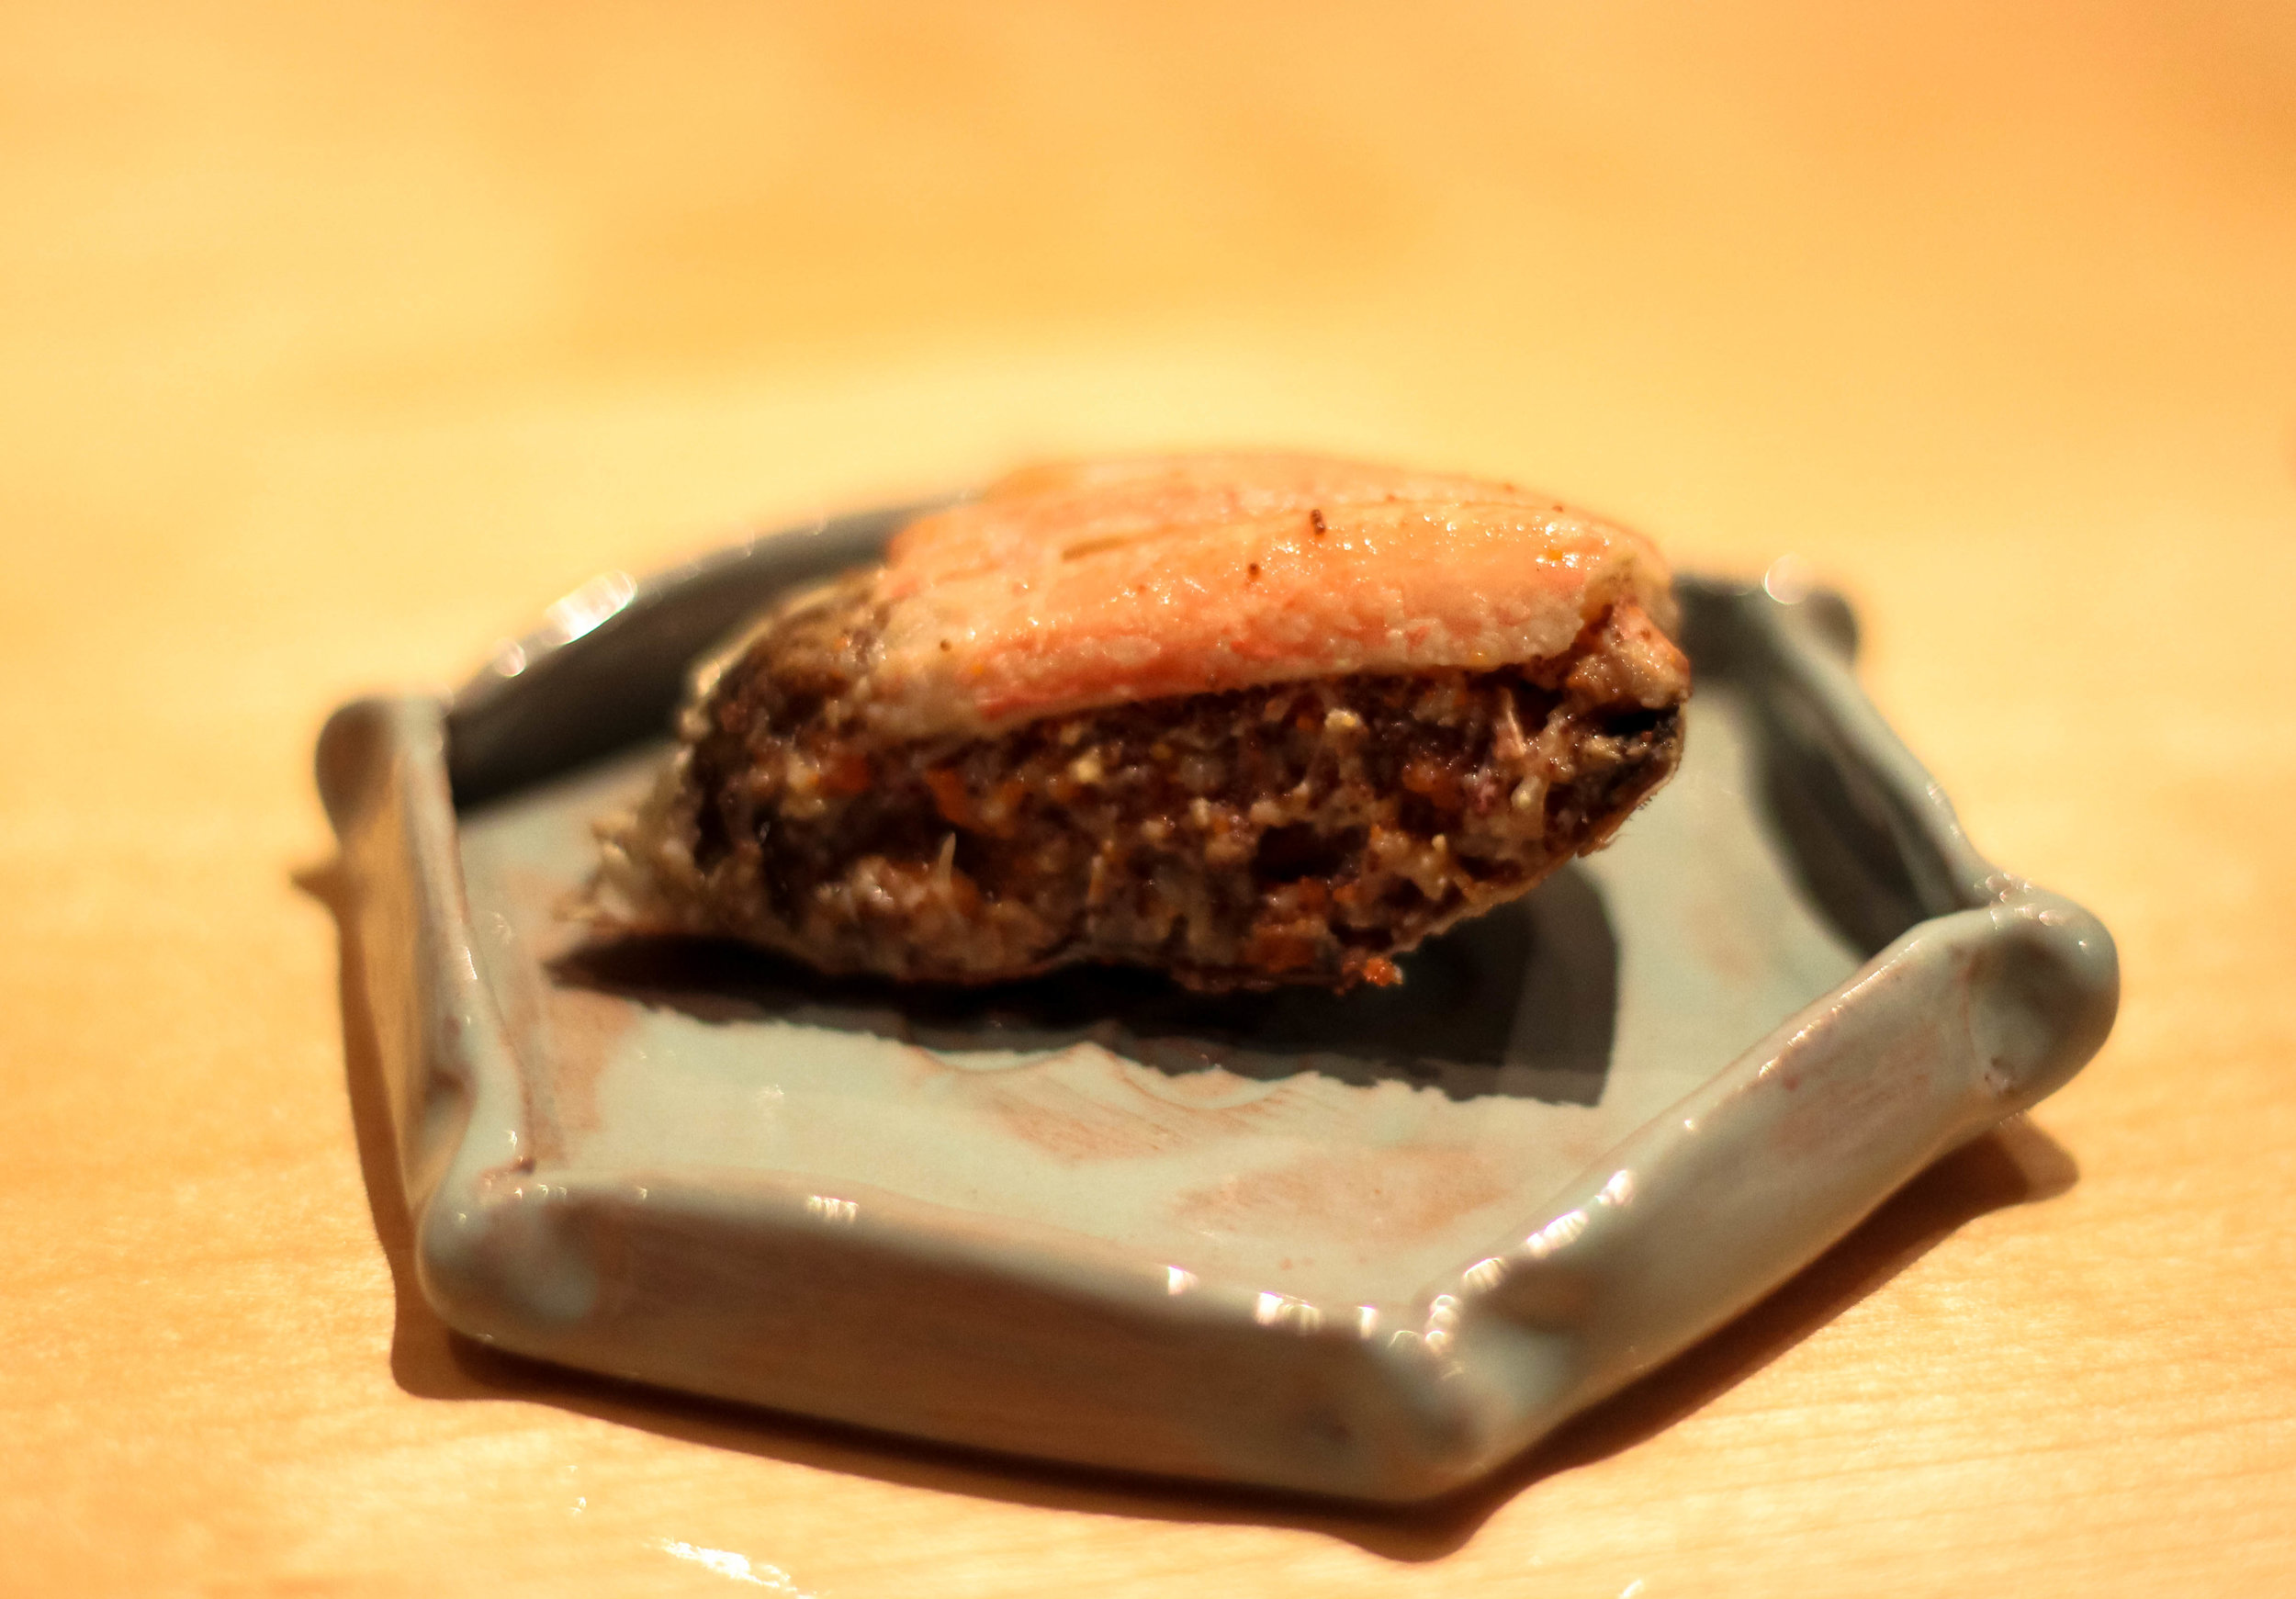 Kegani (horsehair crab) from Hokkaido.